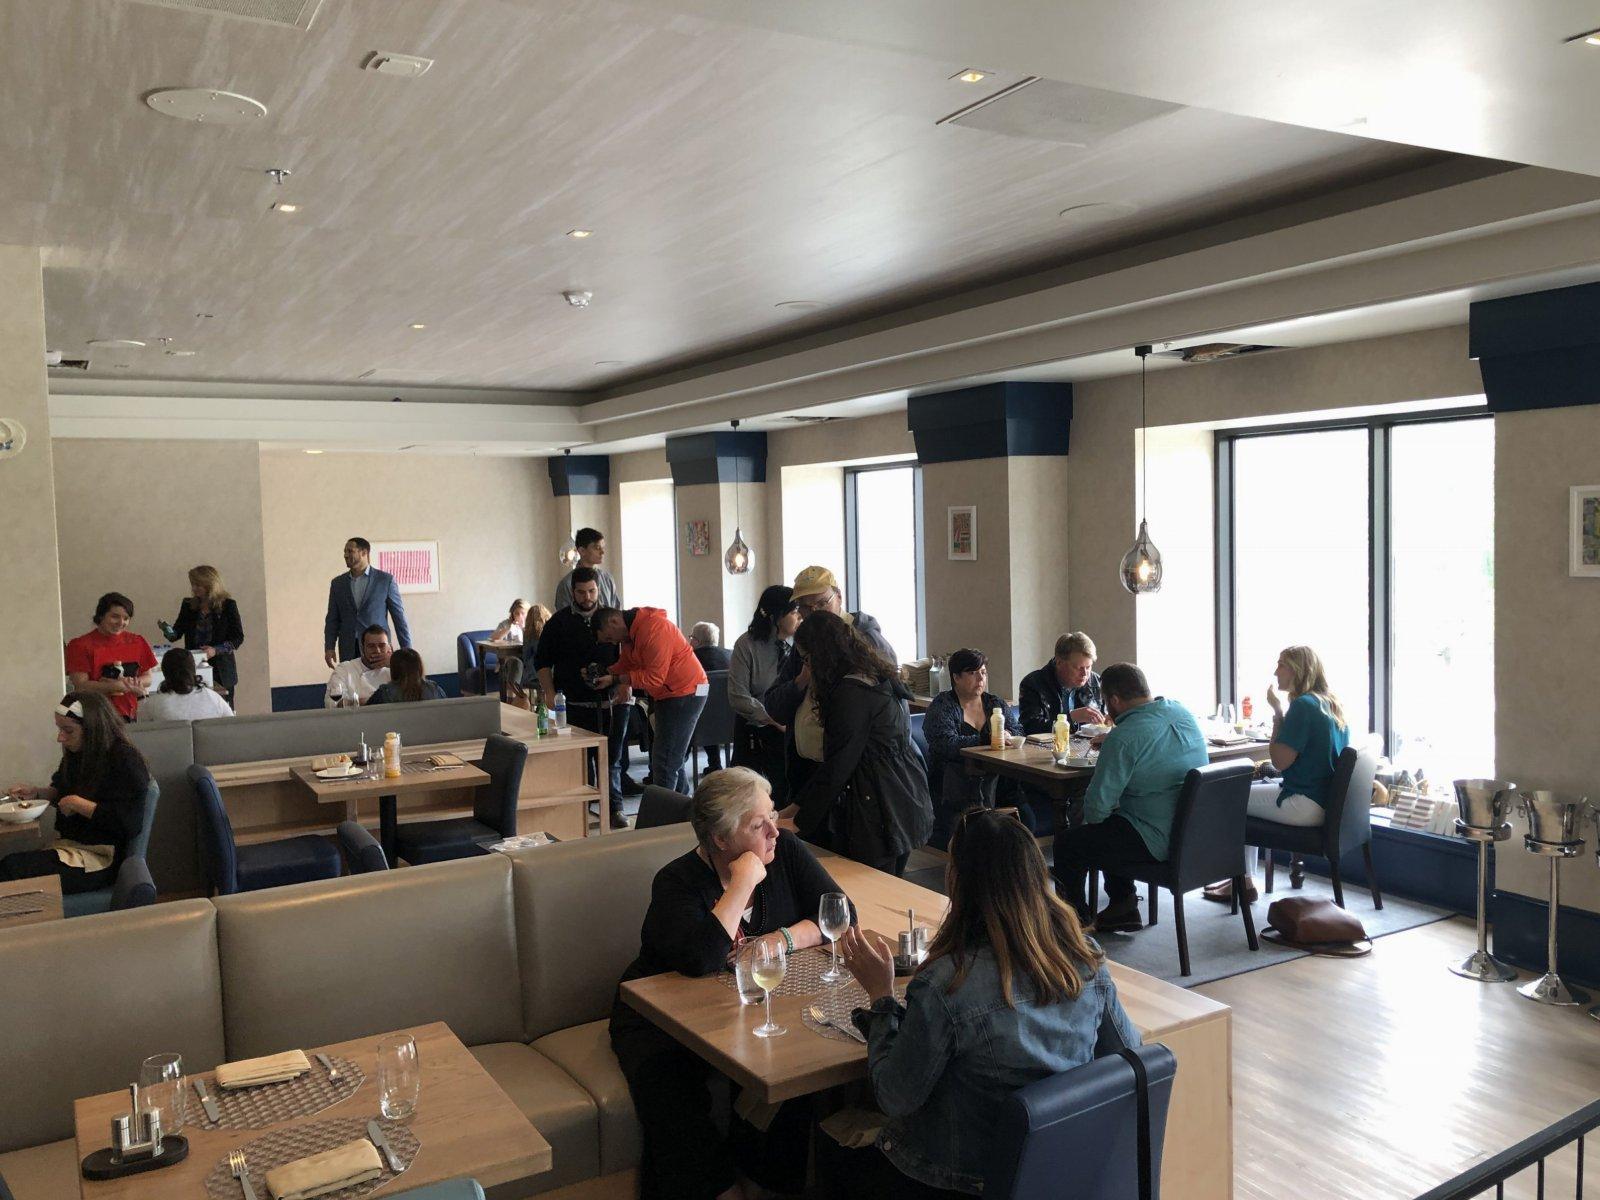 The Aria restaurant at Saint Kate hotel. Photo by Jeramey Jannene.